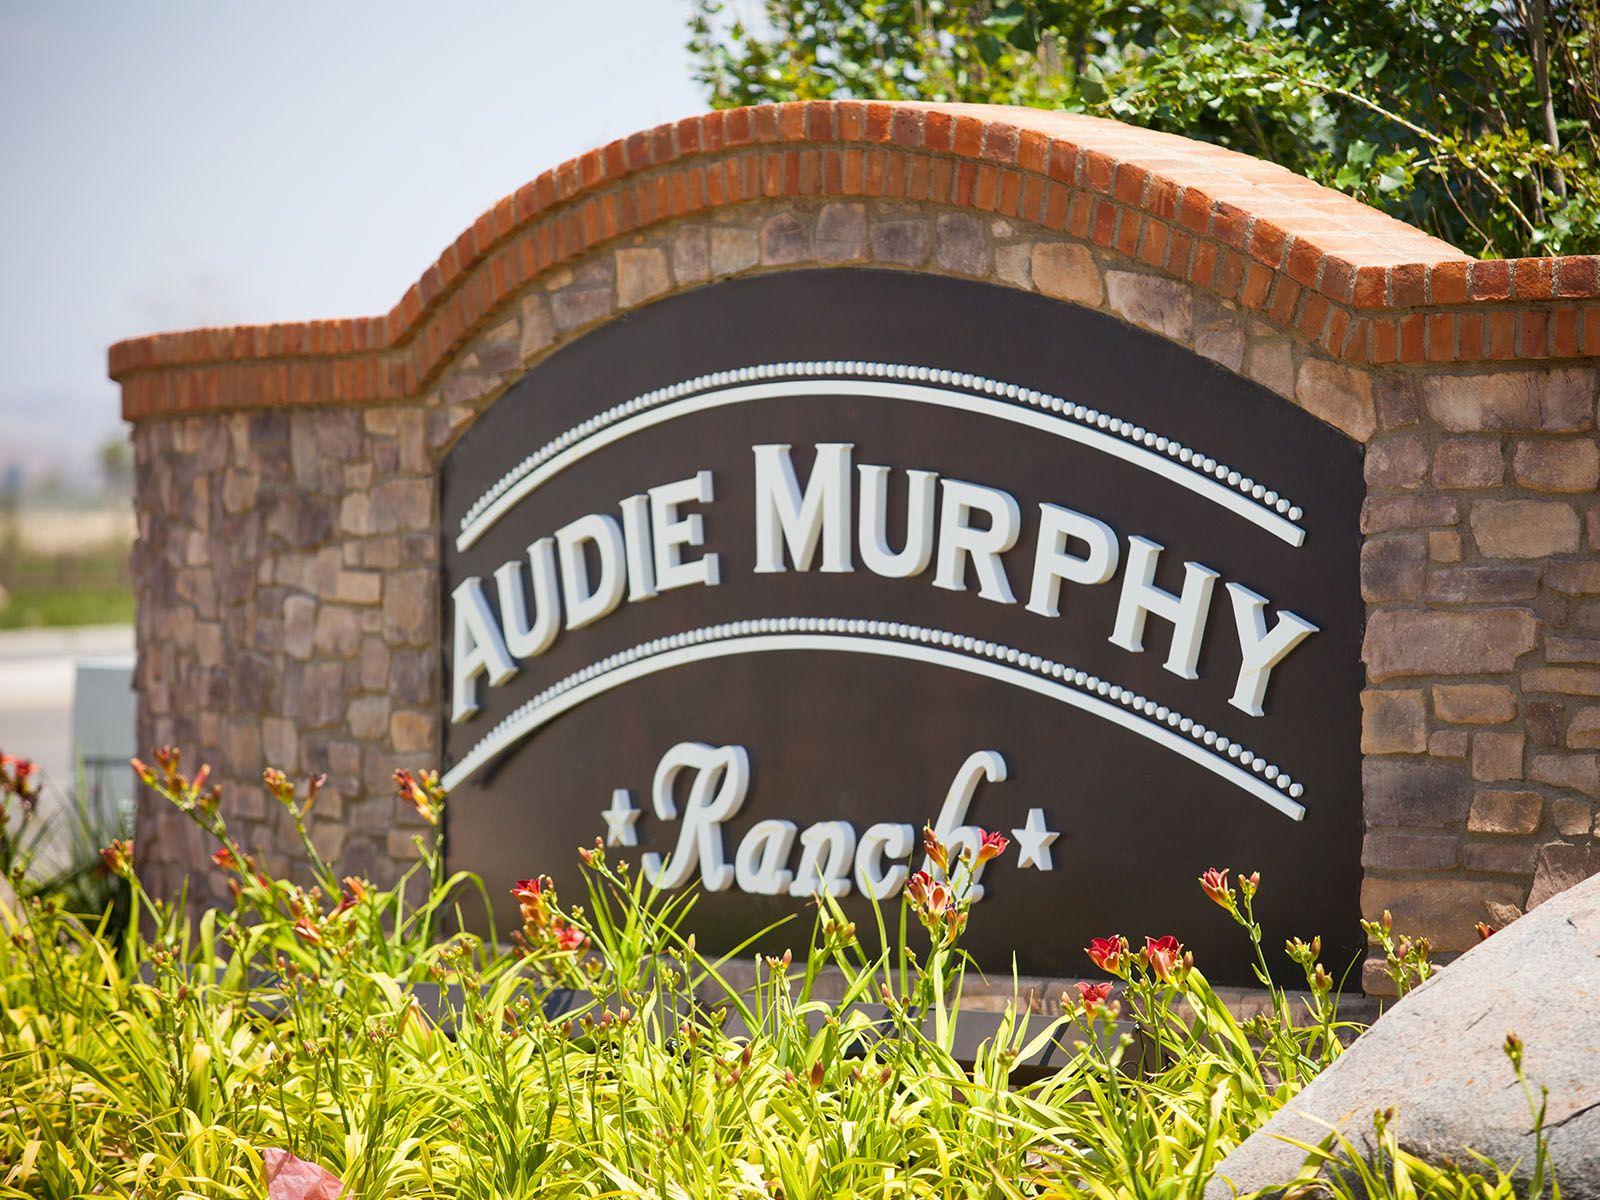 Jasper at Audie Murphy Ranch,92584